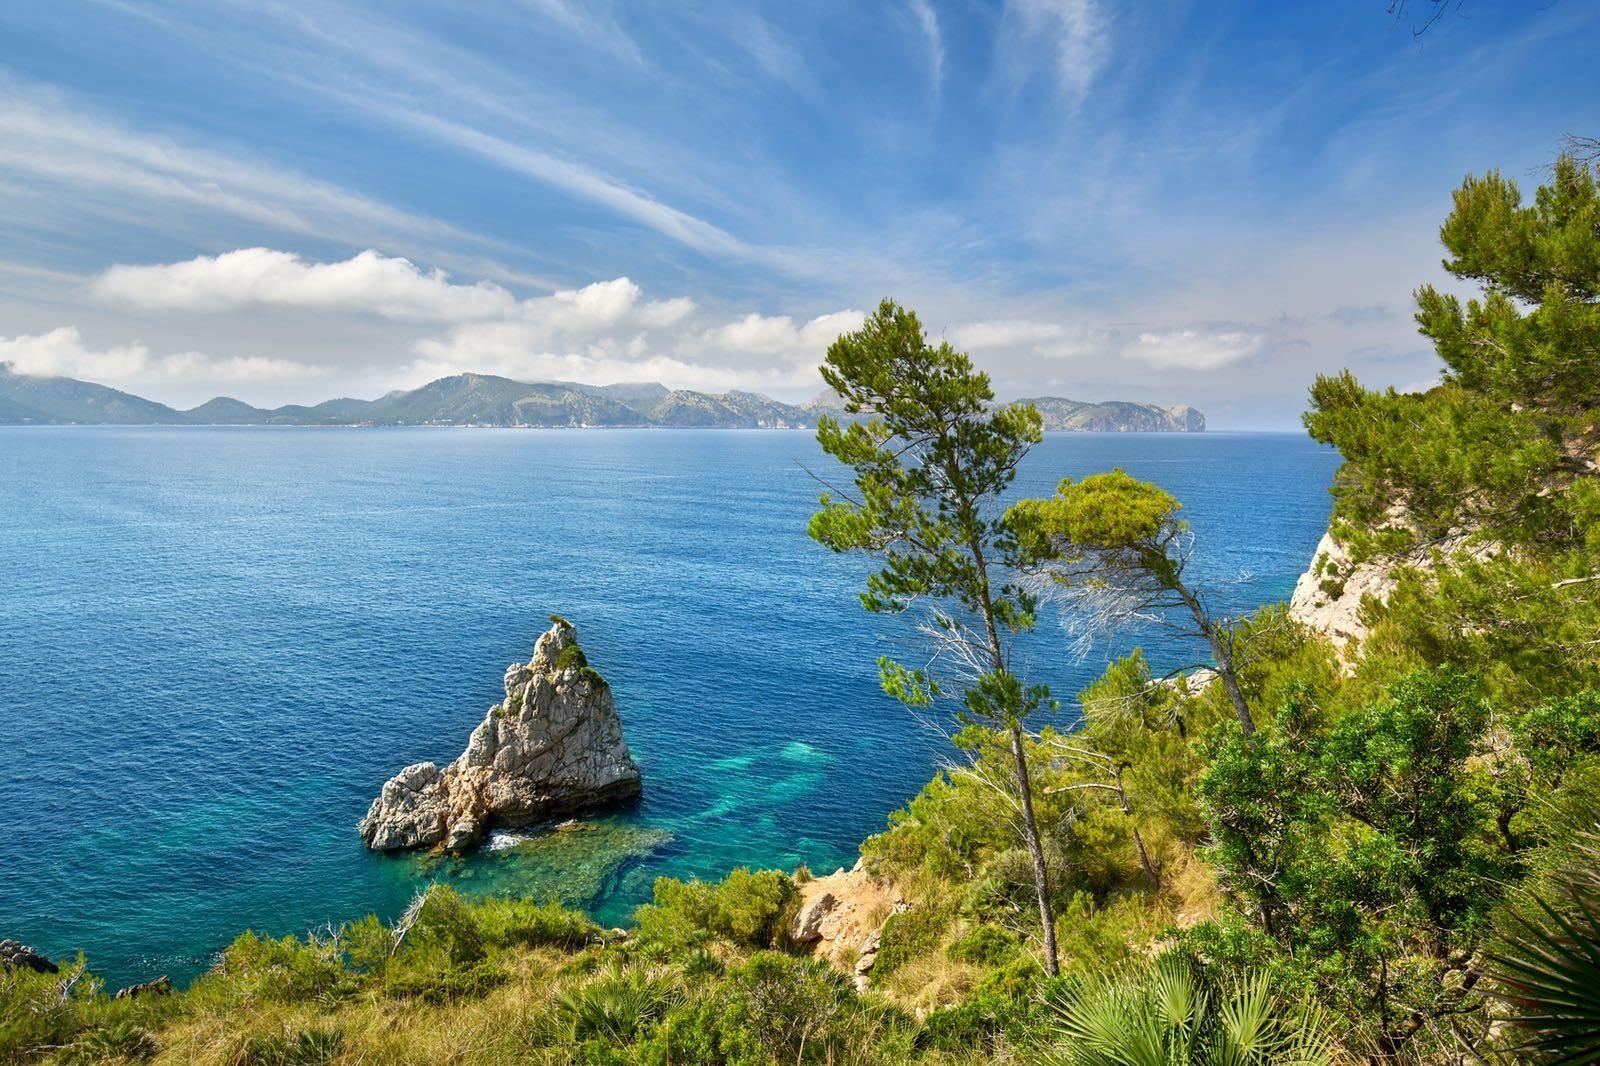 mallorca coast line